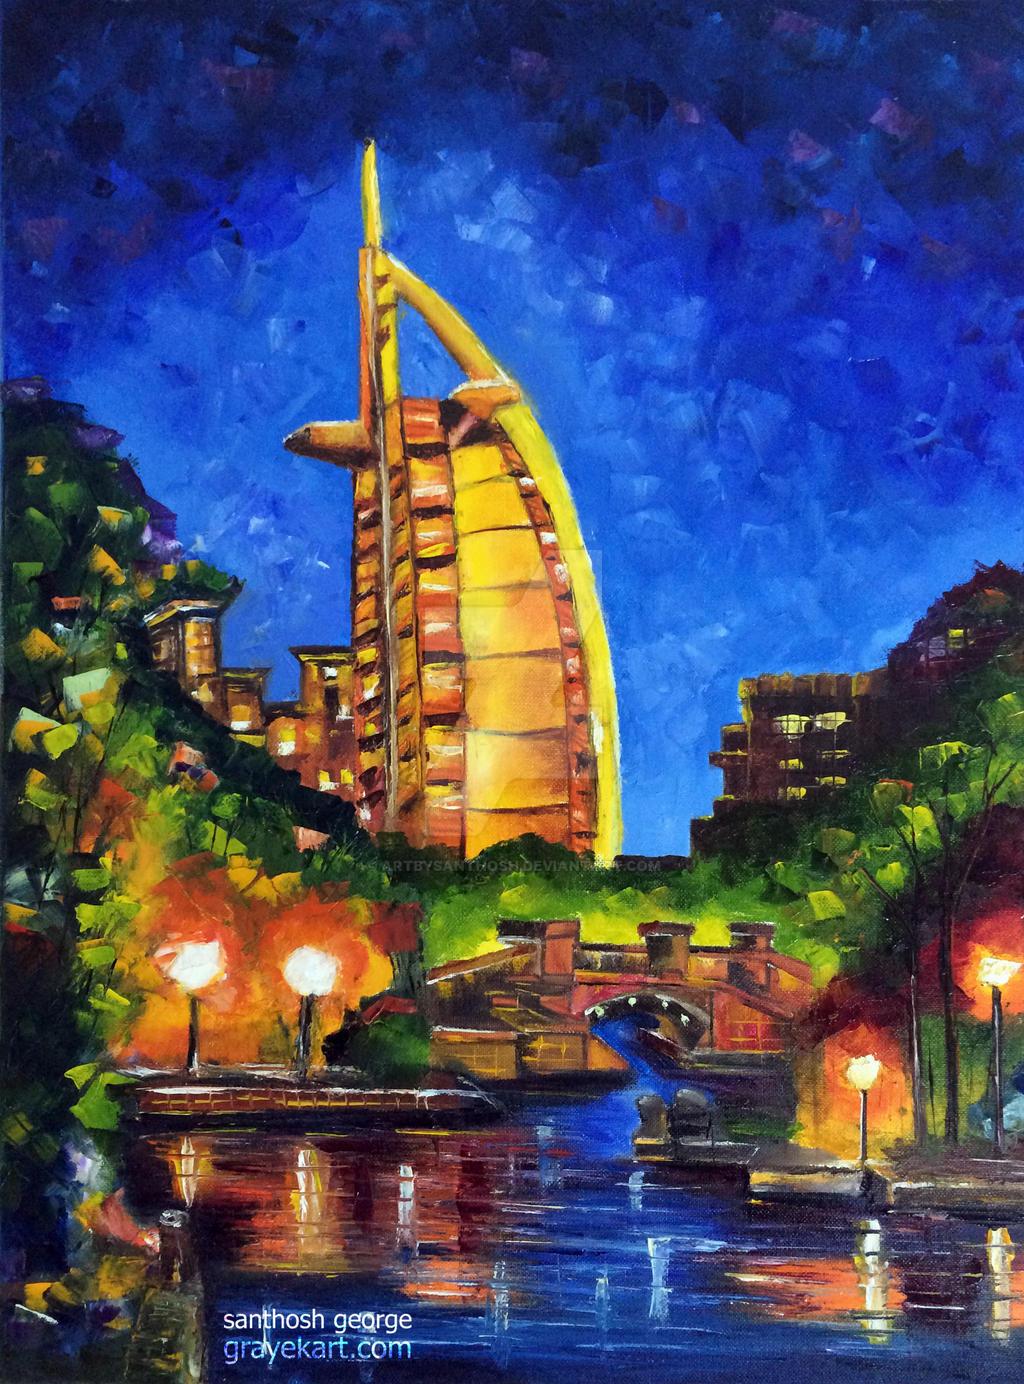 D Painting Exhibition In Dubai : Dubai burj al arab by artbysanthosh on deviantart